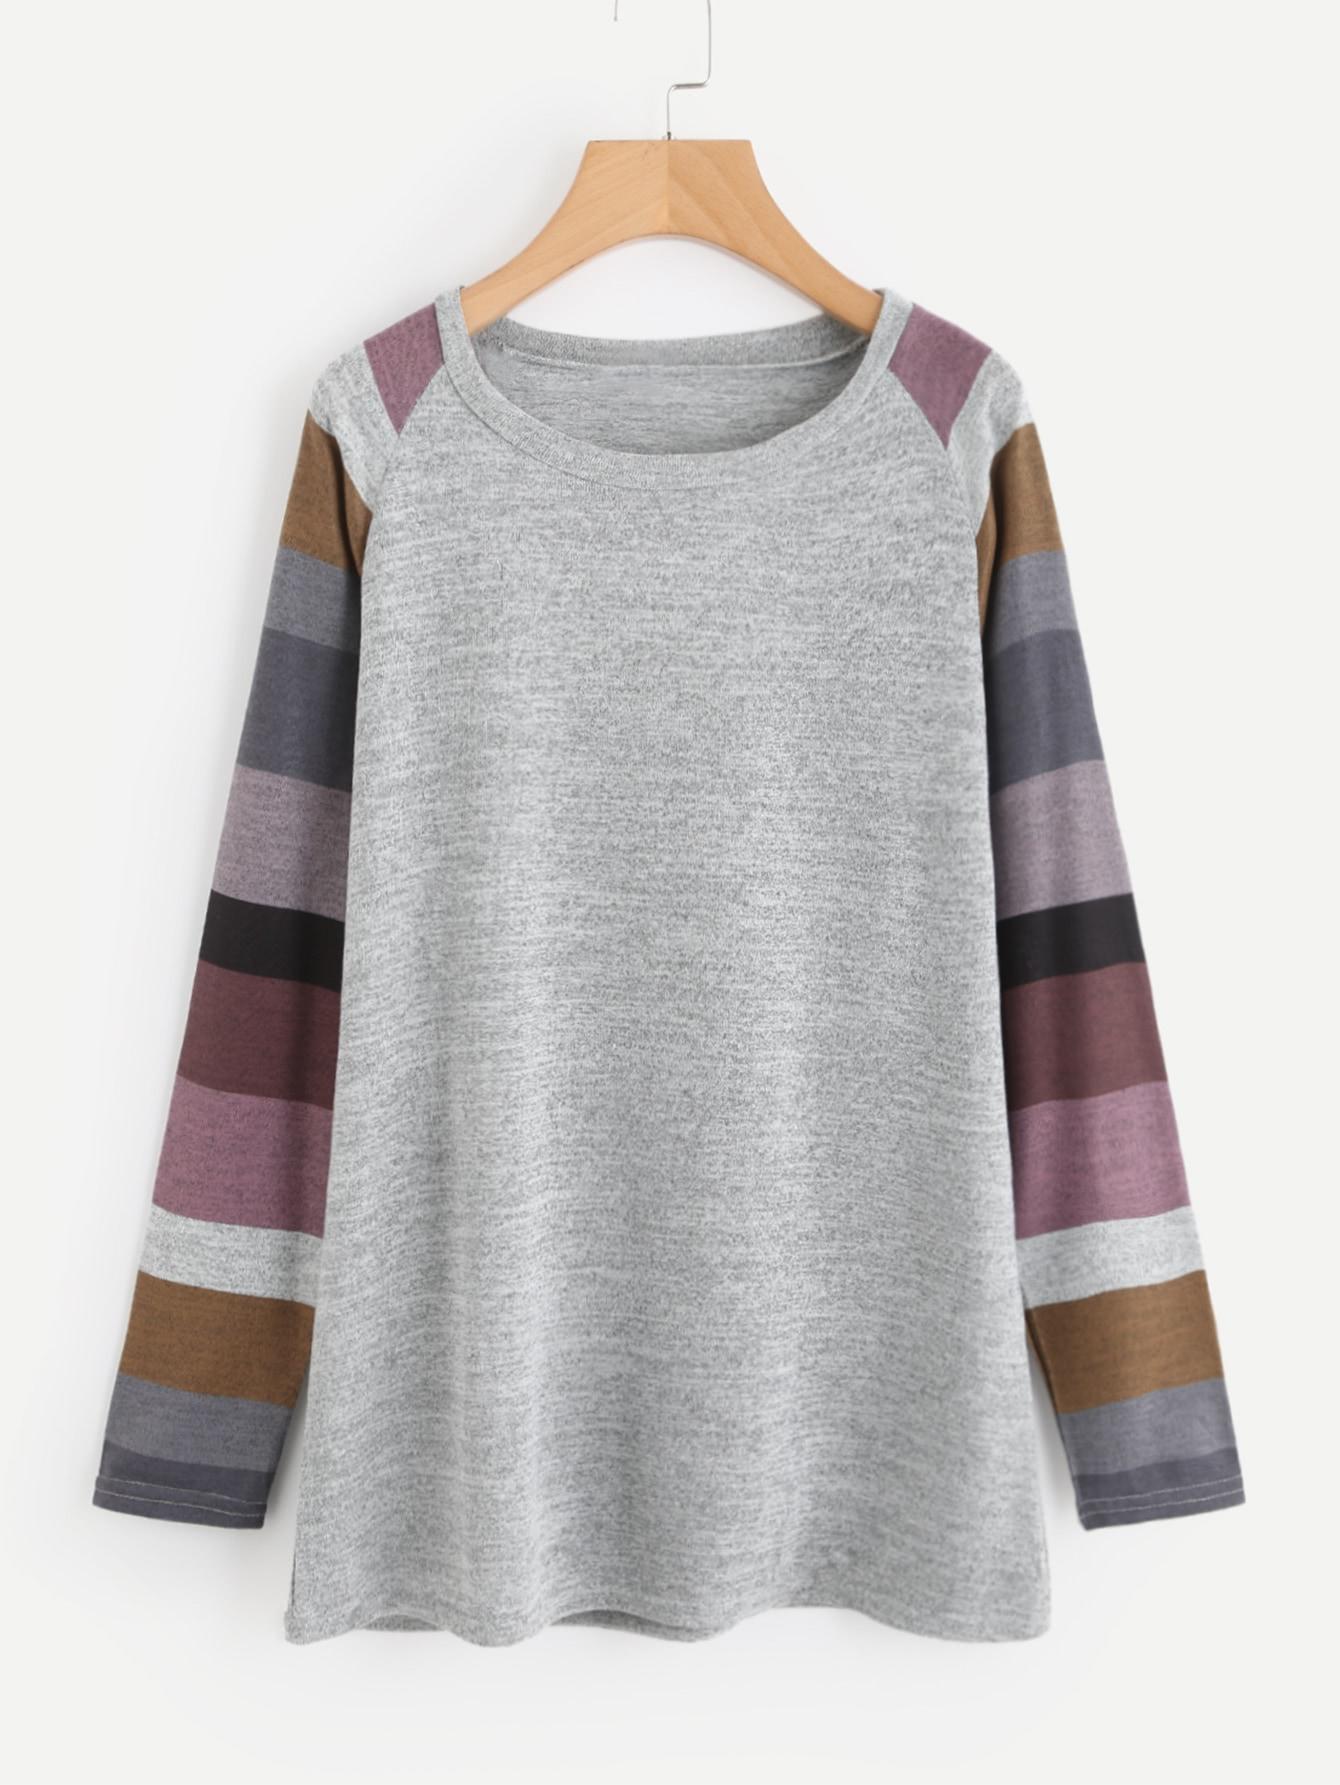 Contrast Striped Raglan Sleeve Marled Knit Tee raglan sleeve marled knit dress